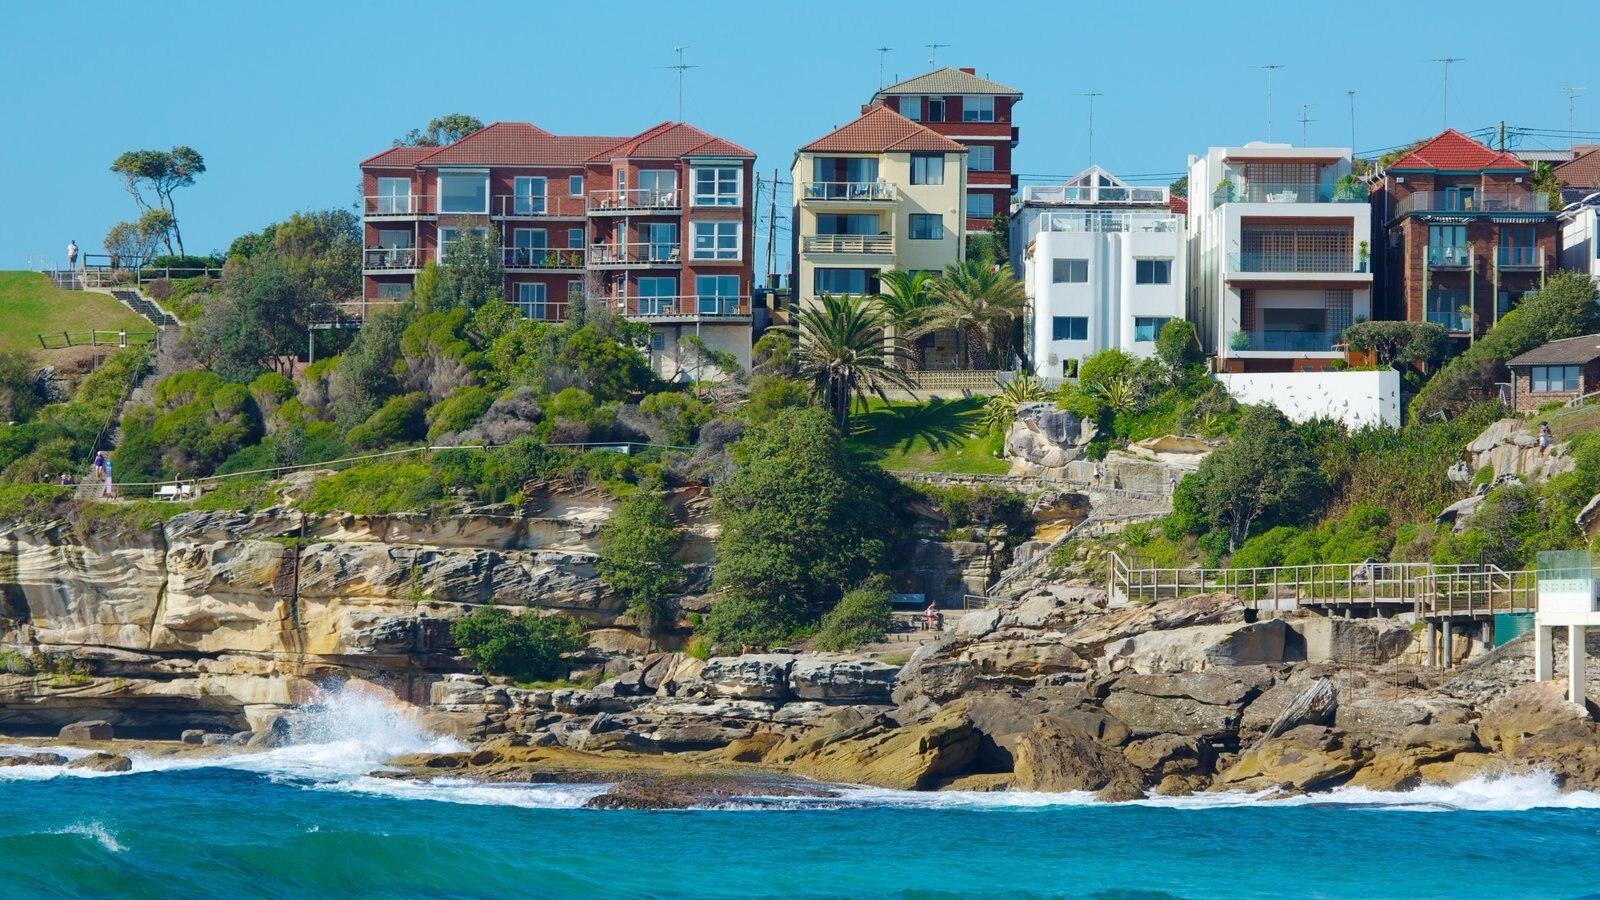 Sydney showing rugged coastline and a coastal town